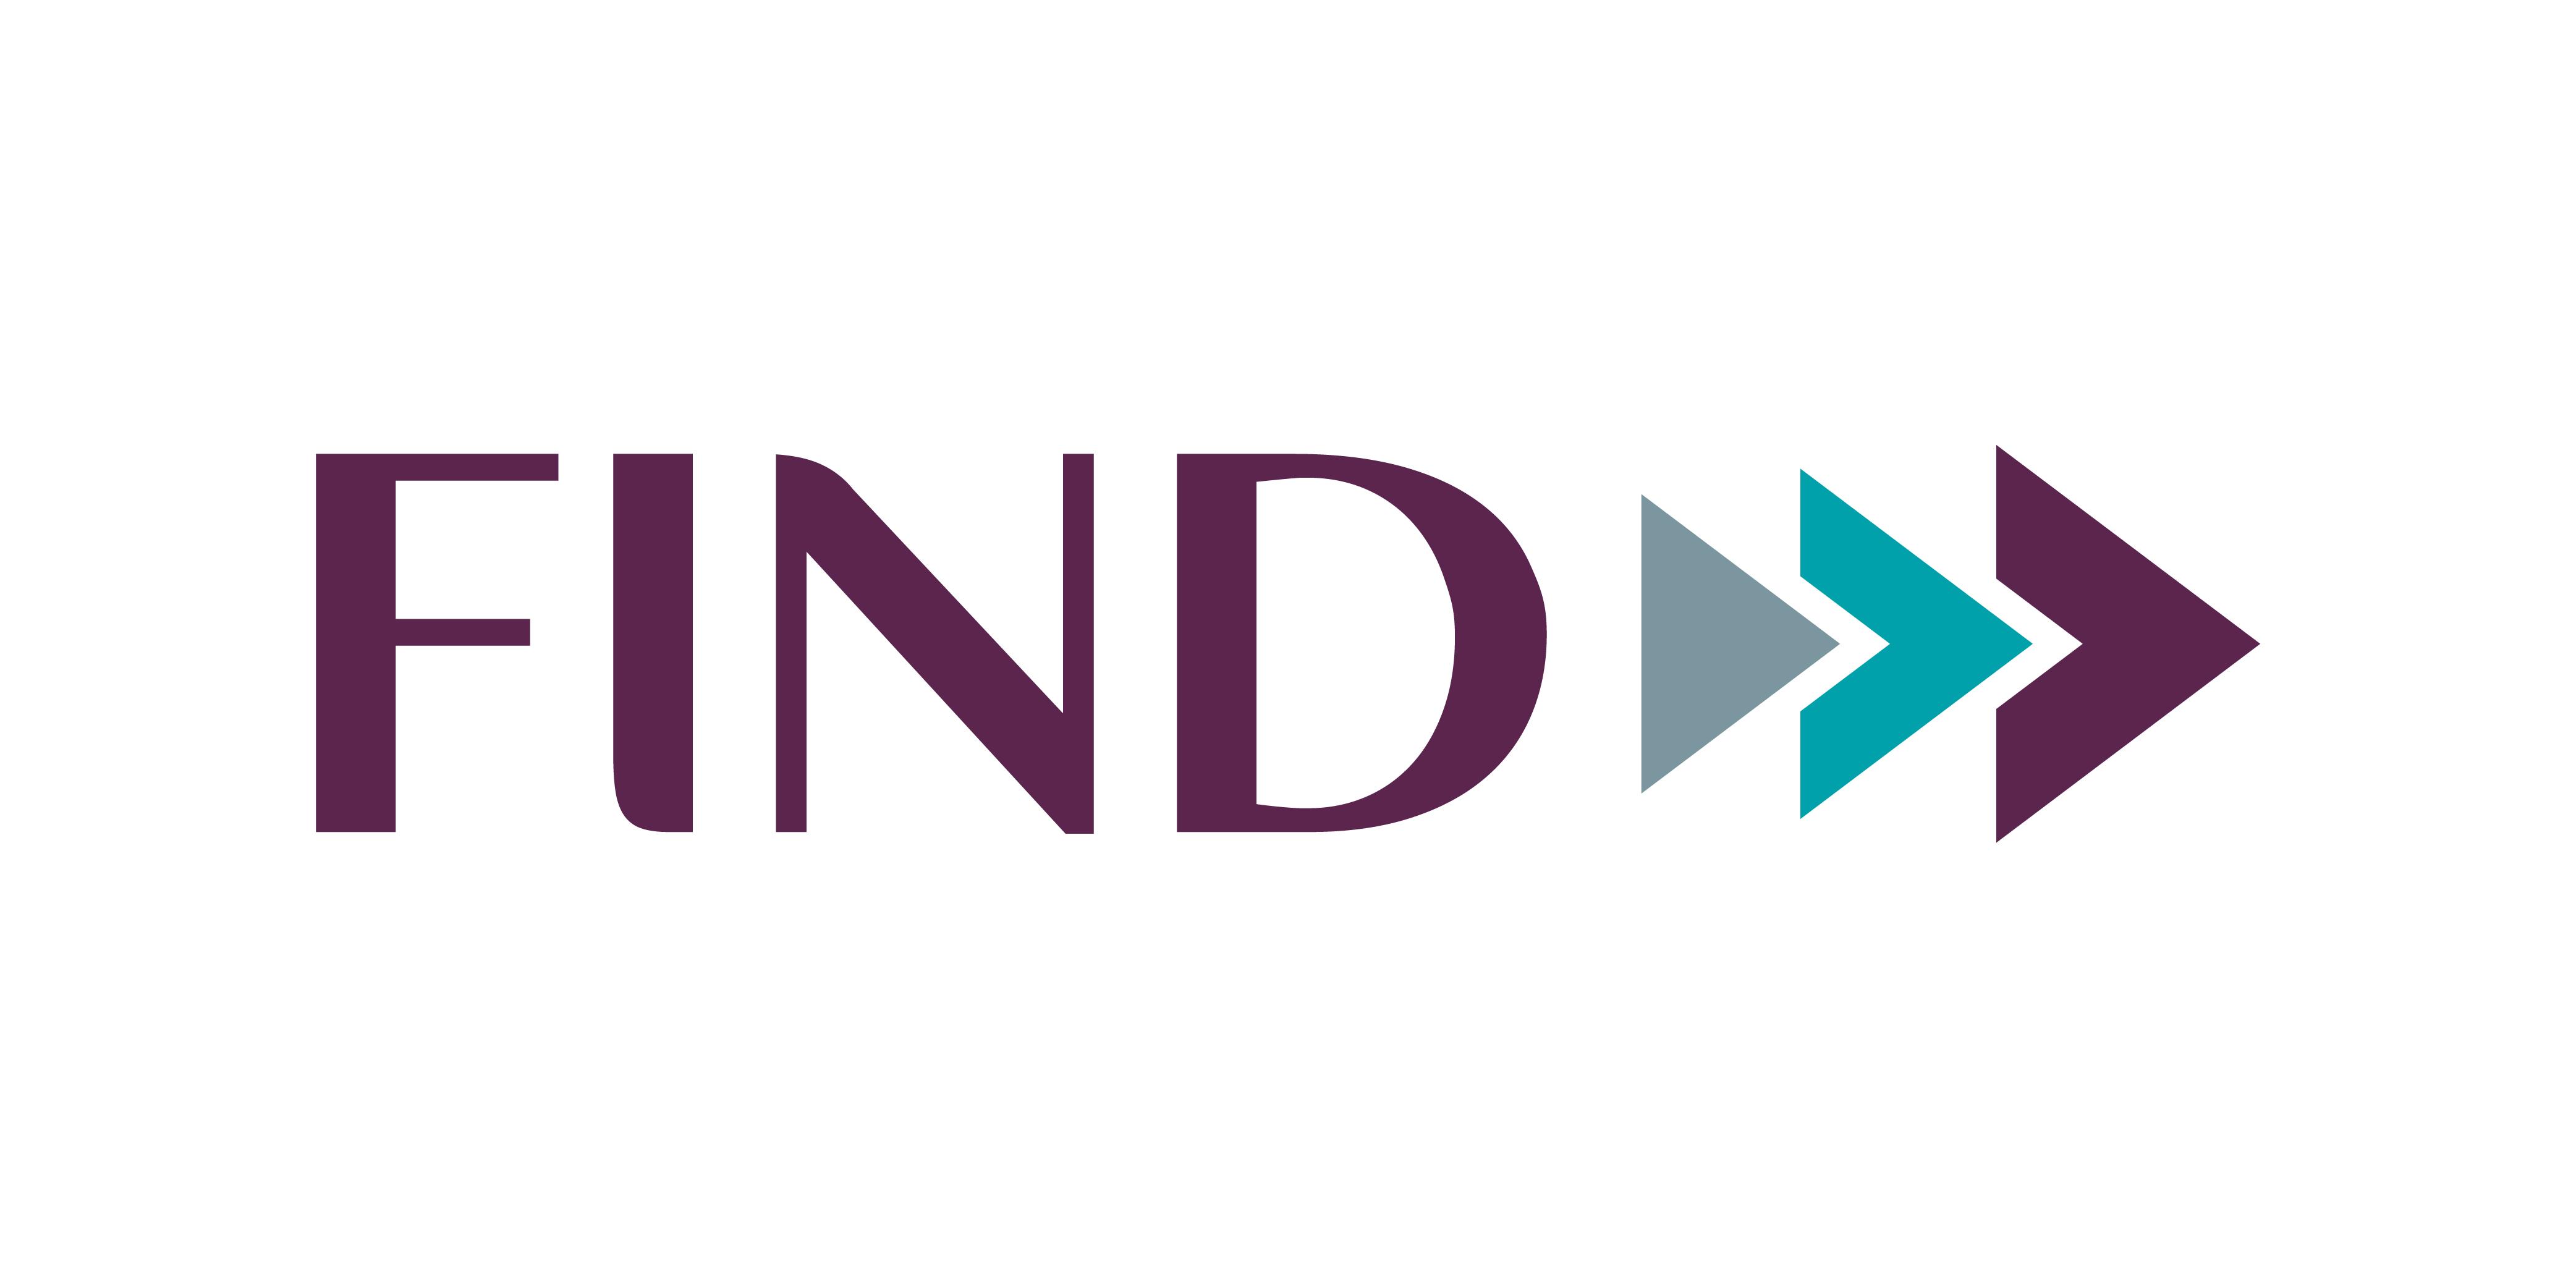 Finddx Logo